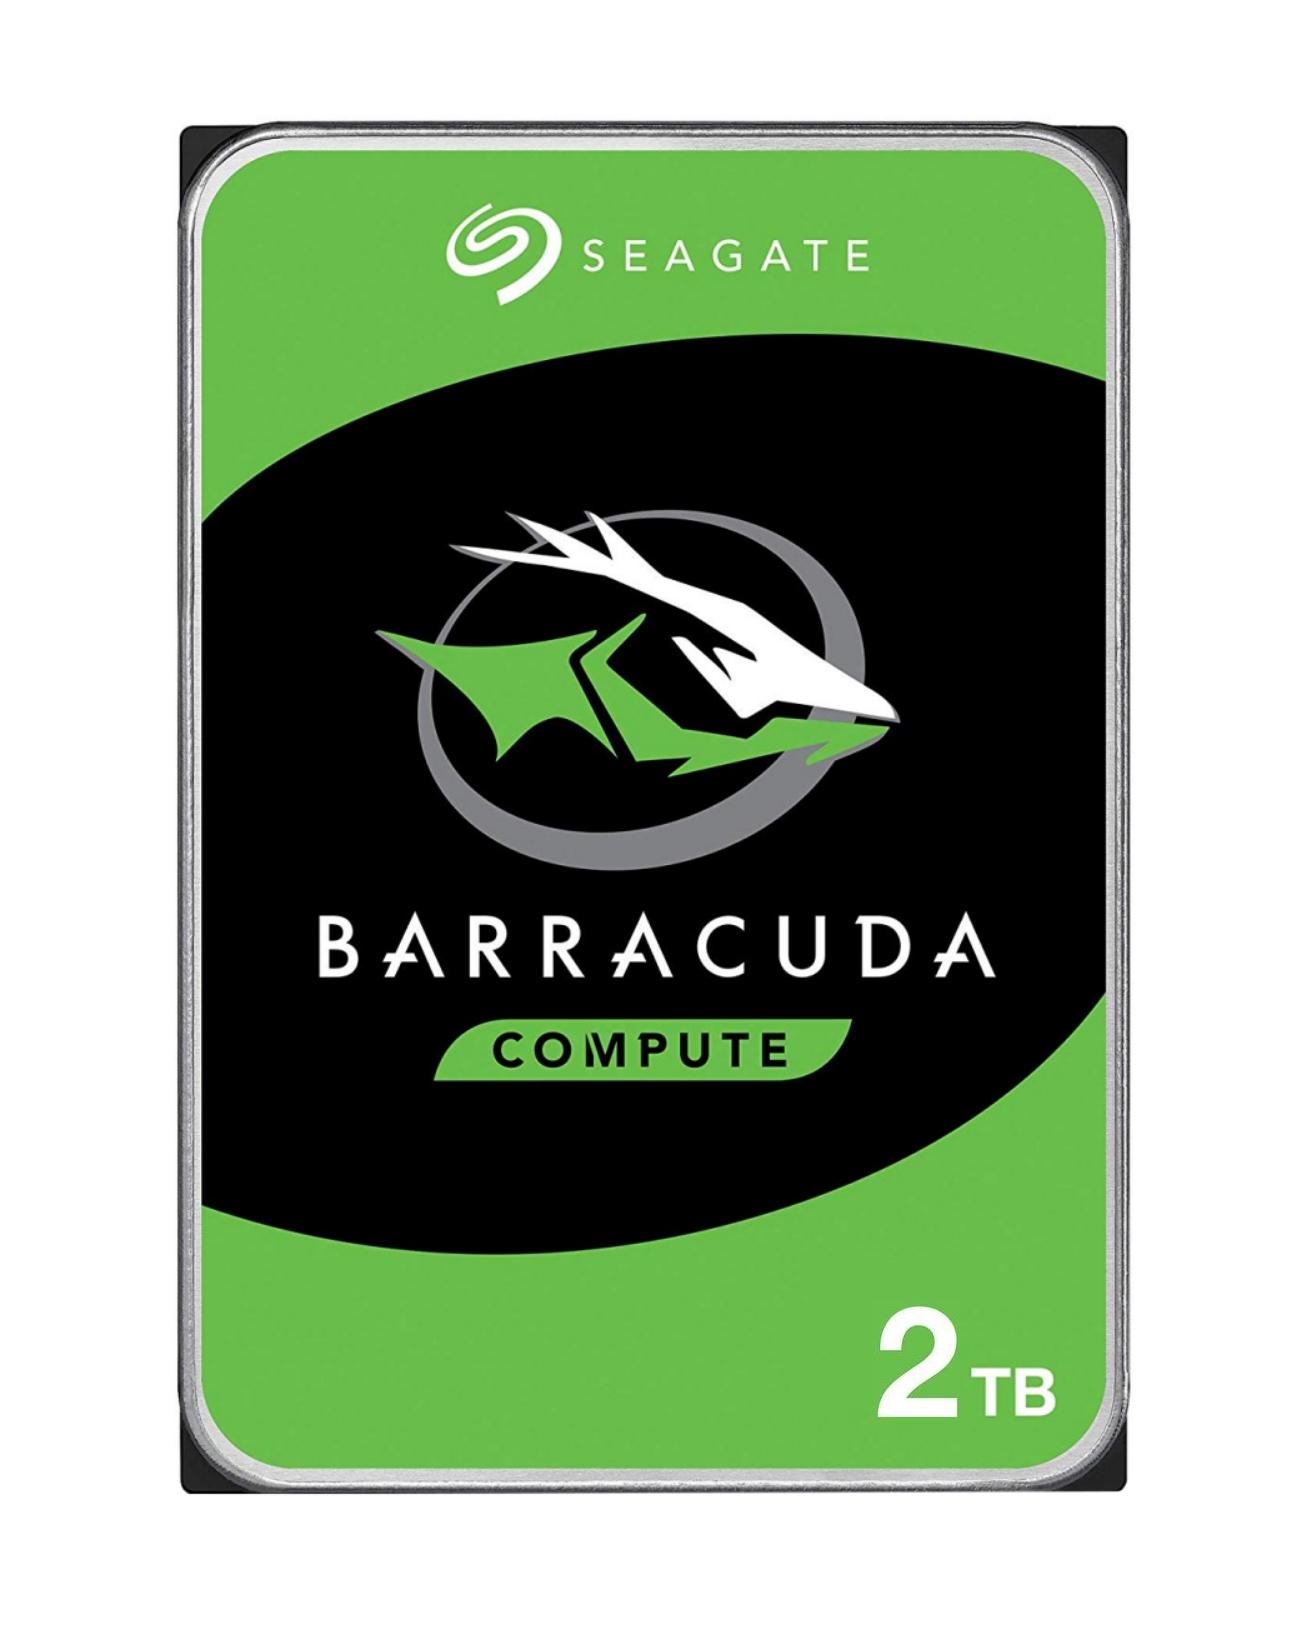 Seagate Barracuda ST2000DM005 - Festplatte - 2 TB